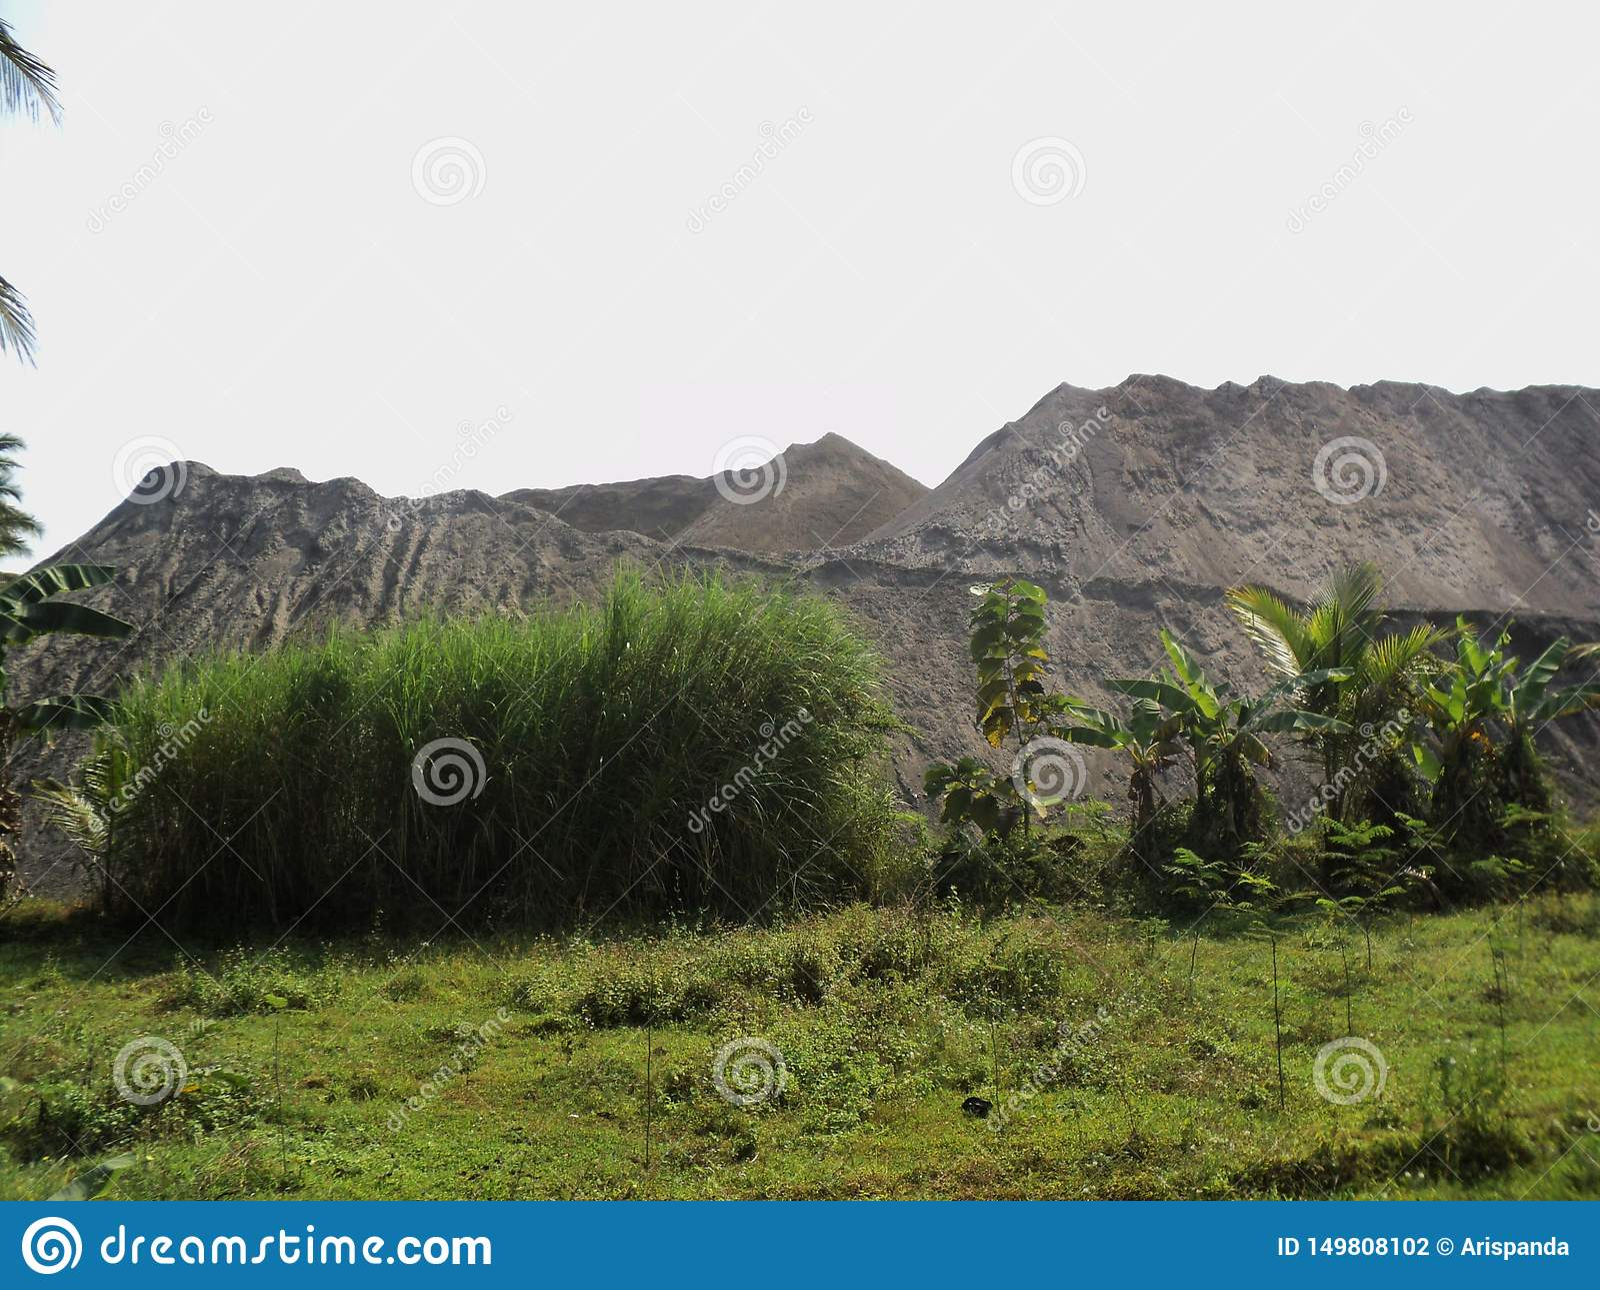 Mountain-shapehigh mountain stacks of mountain sandd sand pile